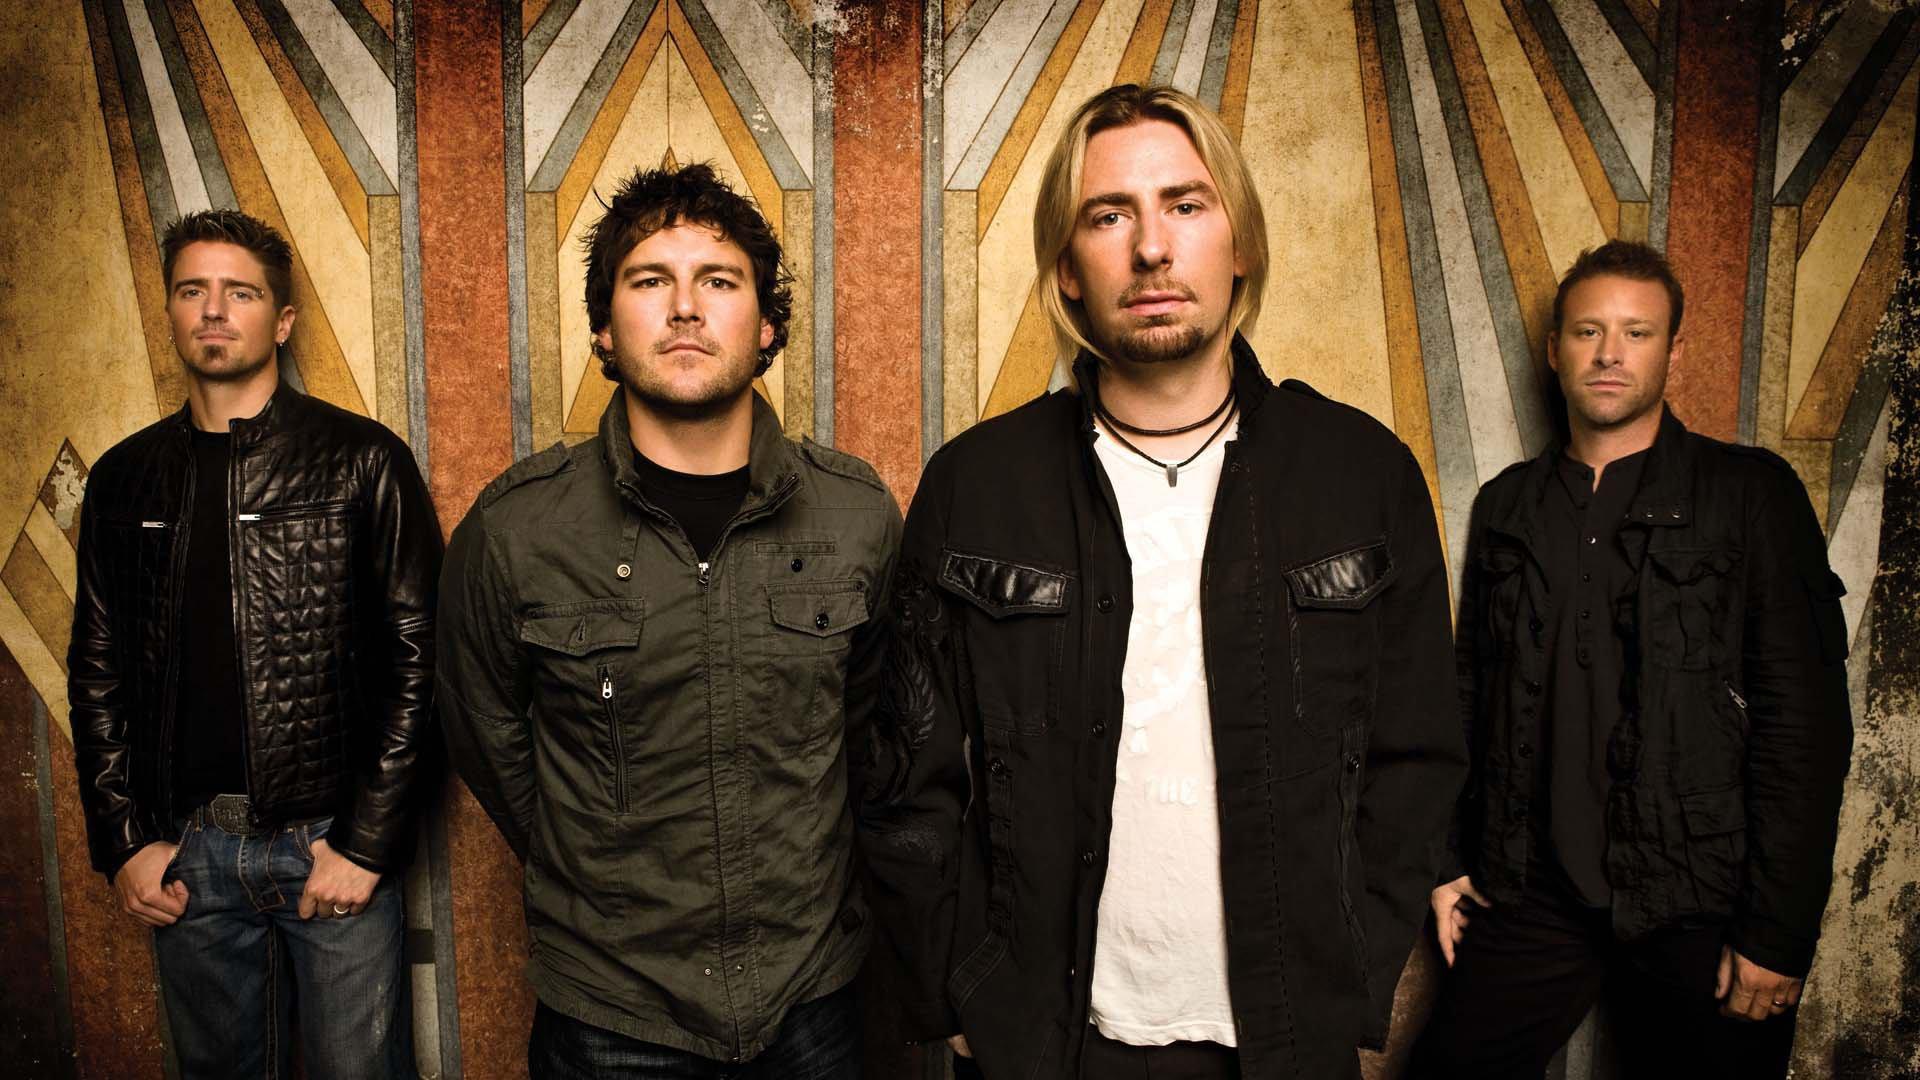 Nickelback Background